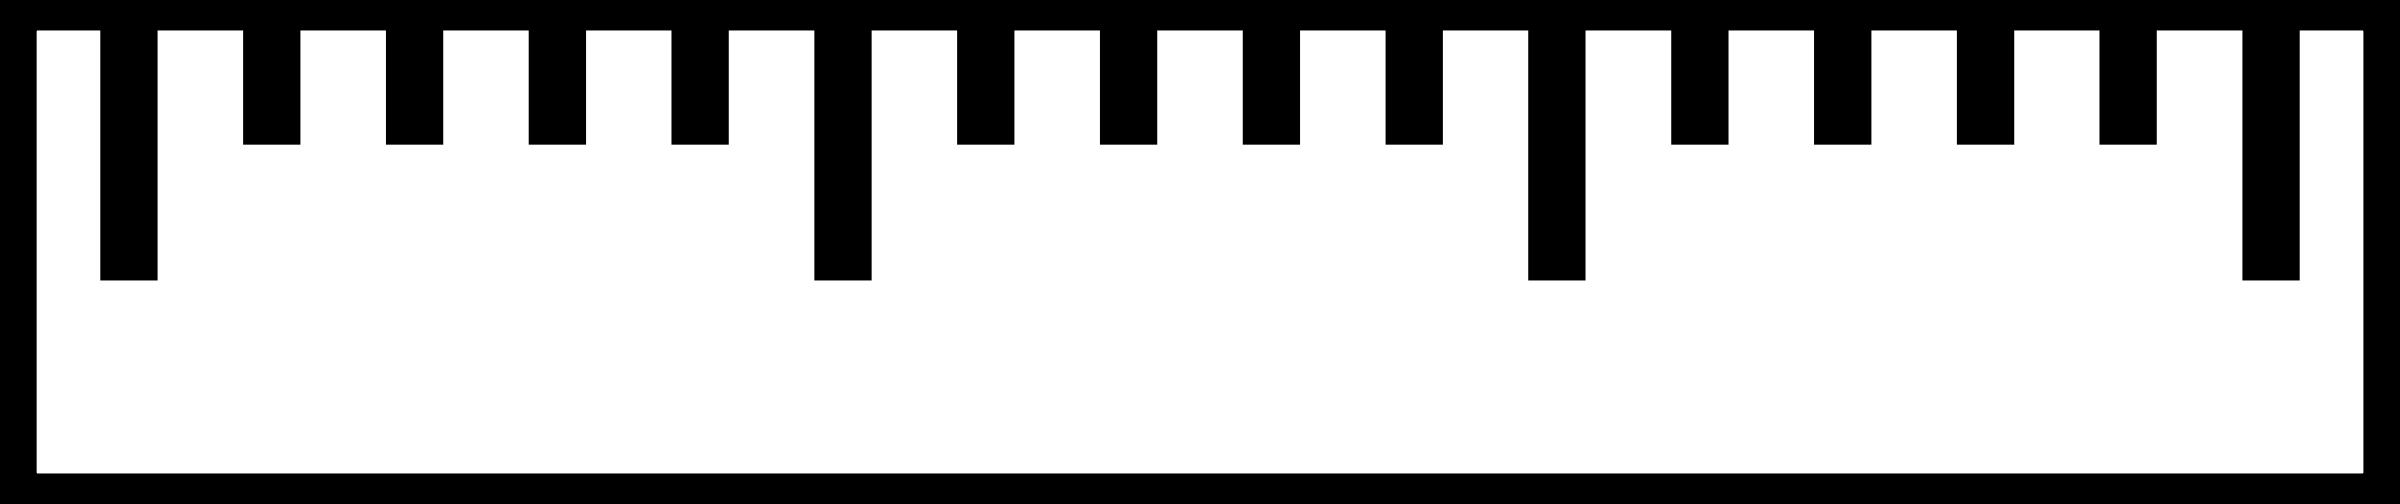 computer ruler